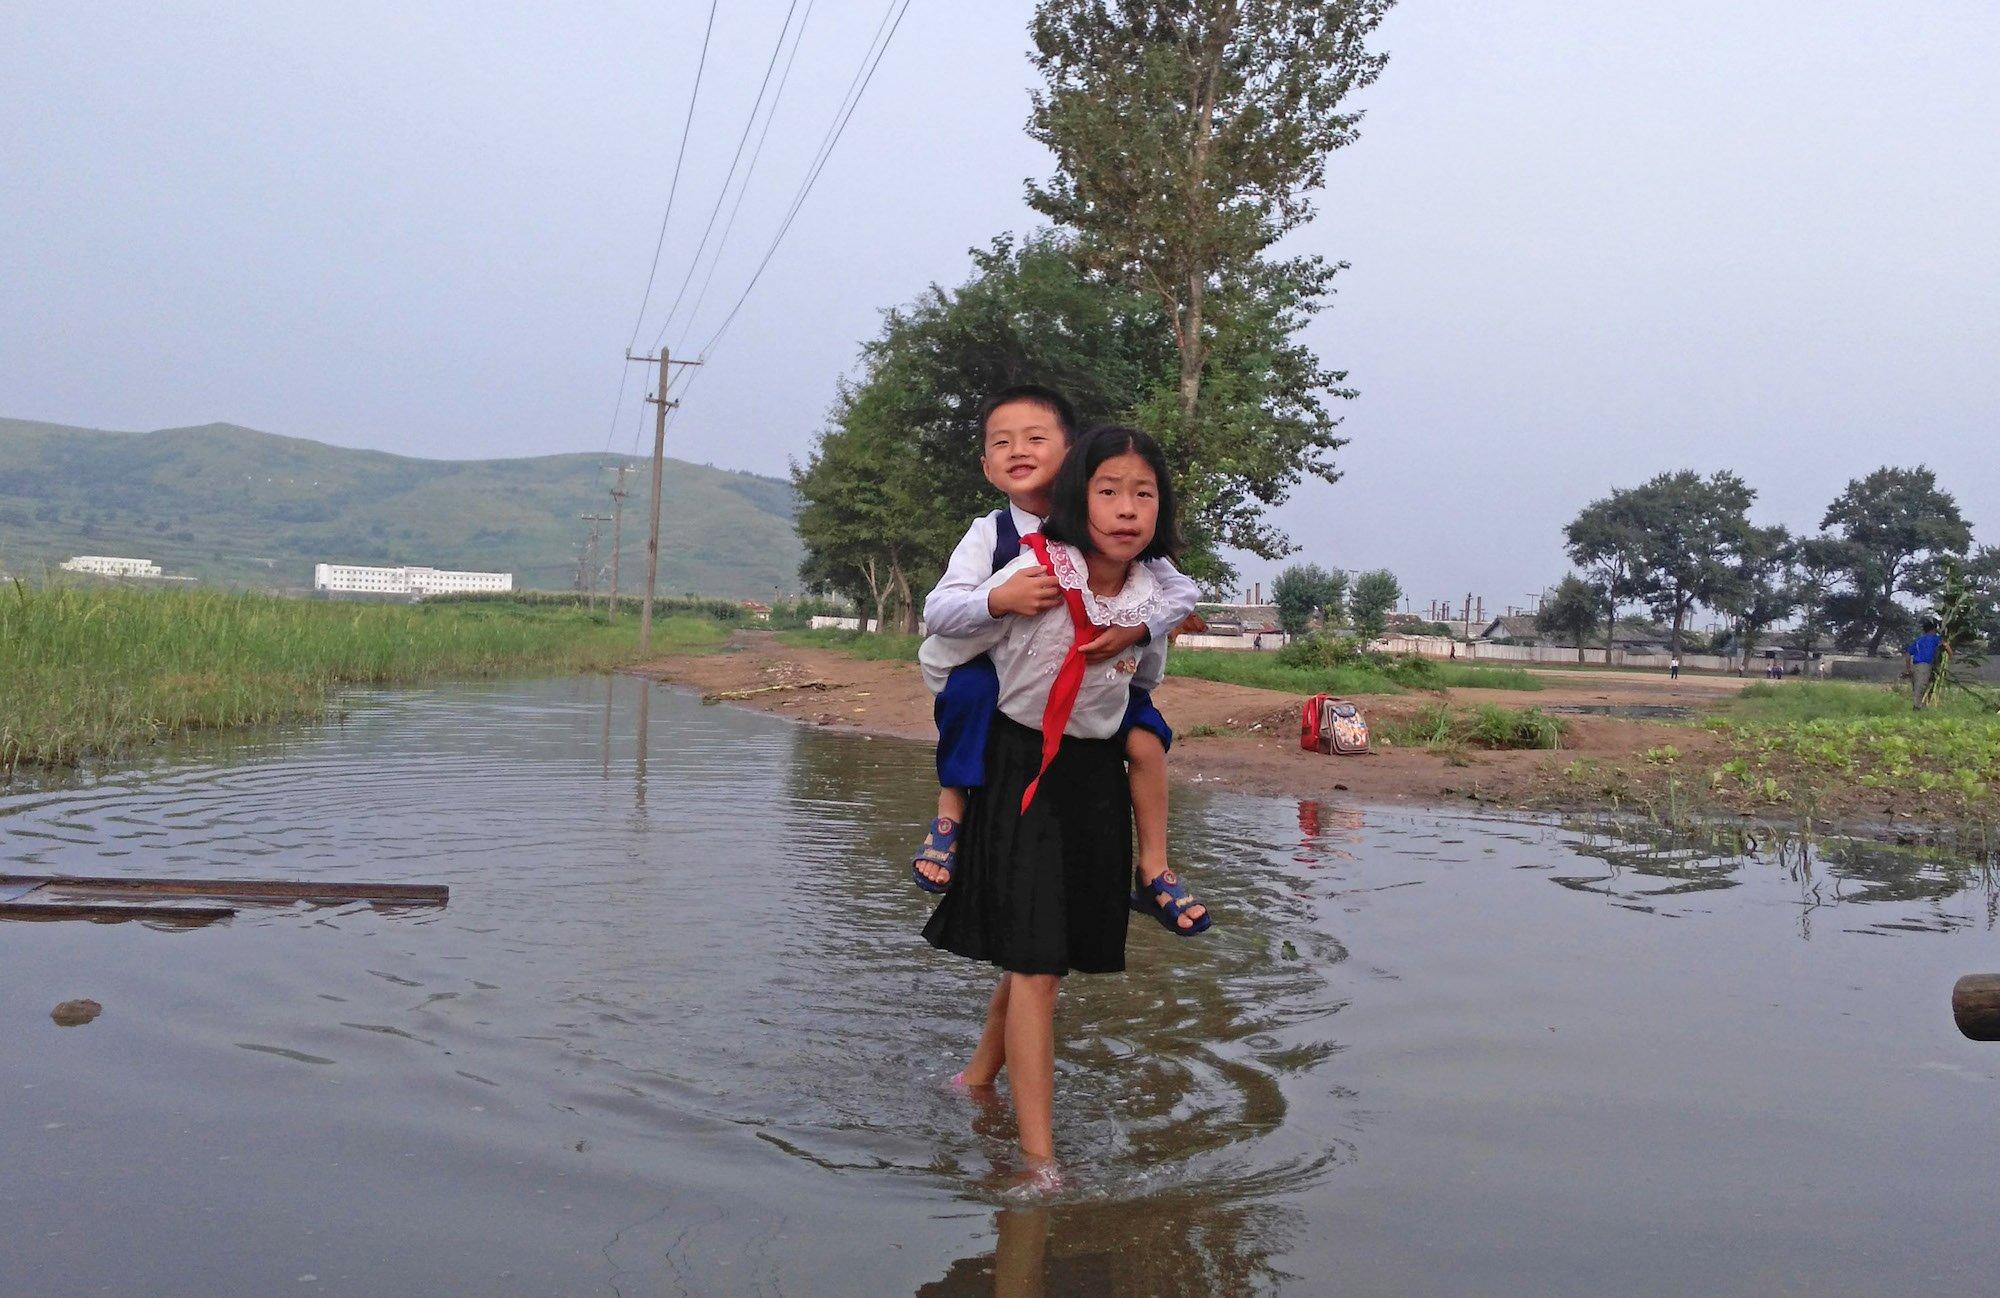 H ζωή στη Βόρεια Κορέα μέσα από ένα άλμπουμ φωτογραφιών